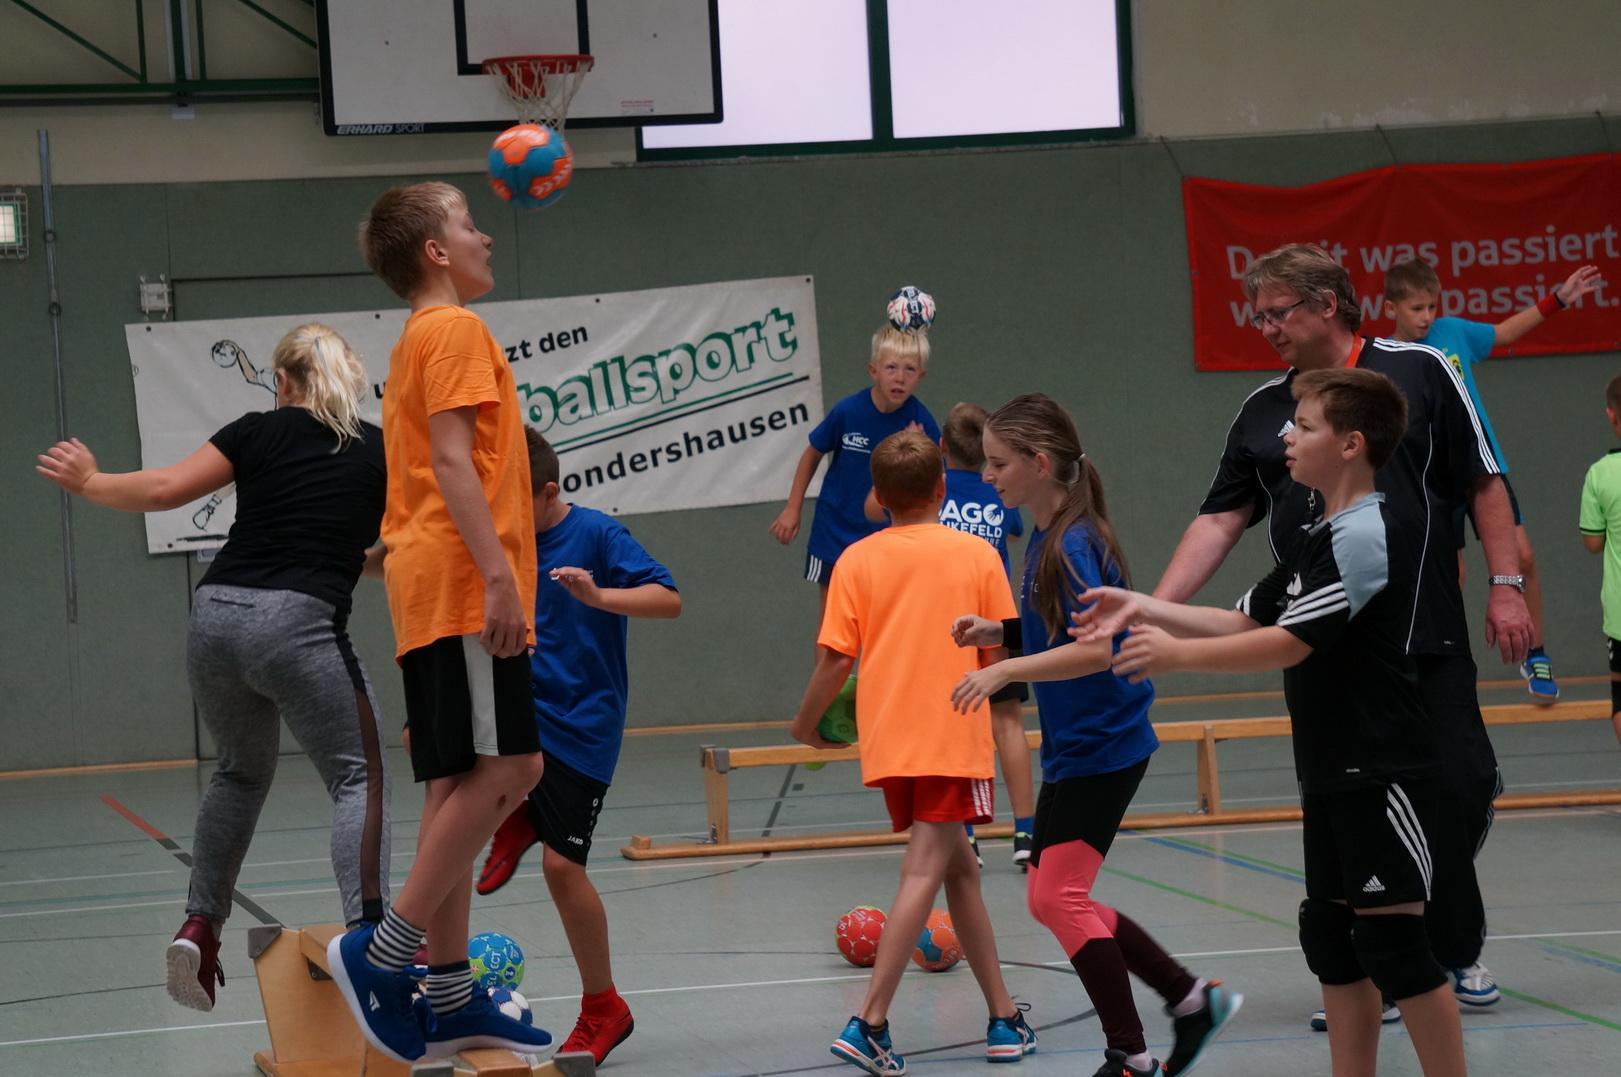 201808_Handballcamp_SDH_MG_182w